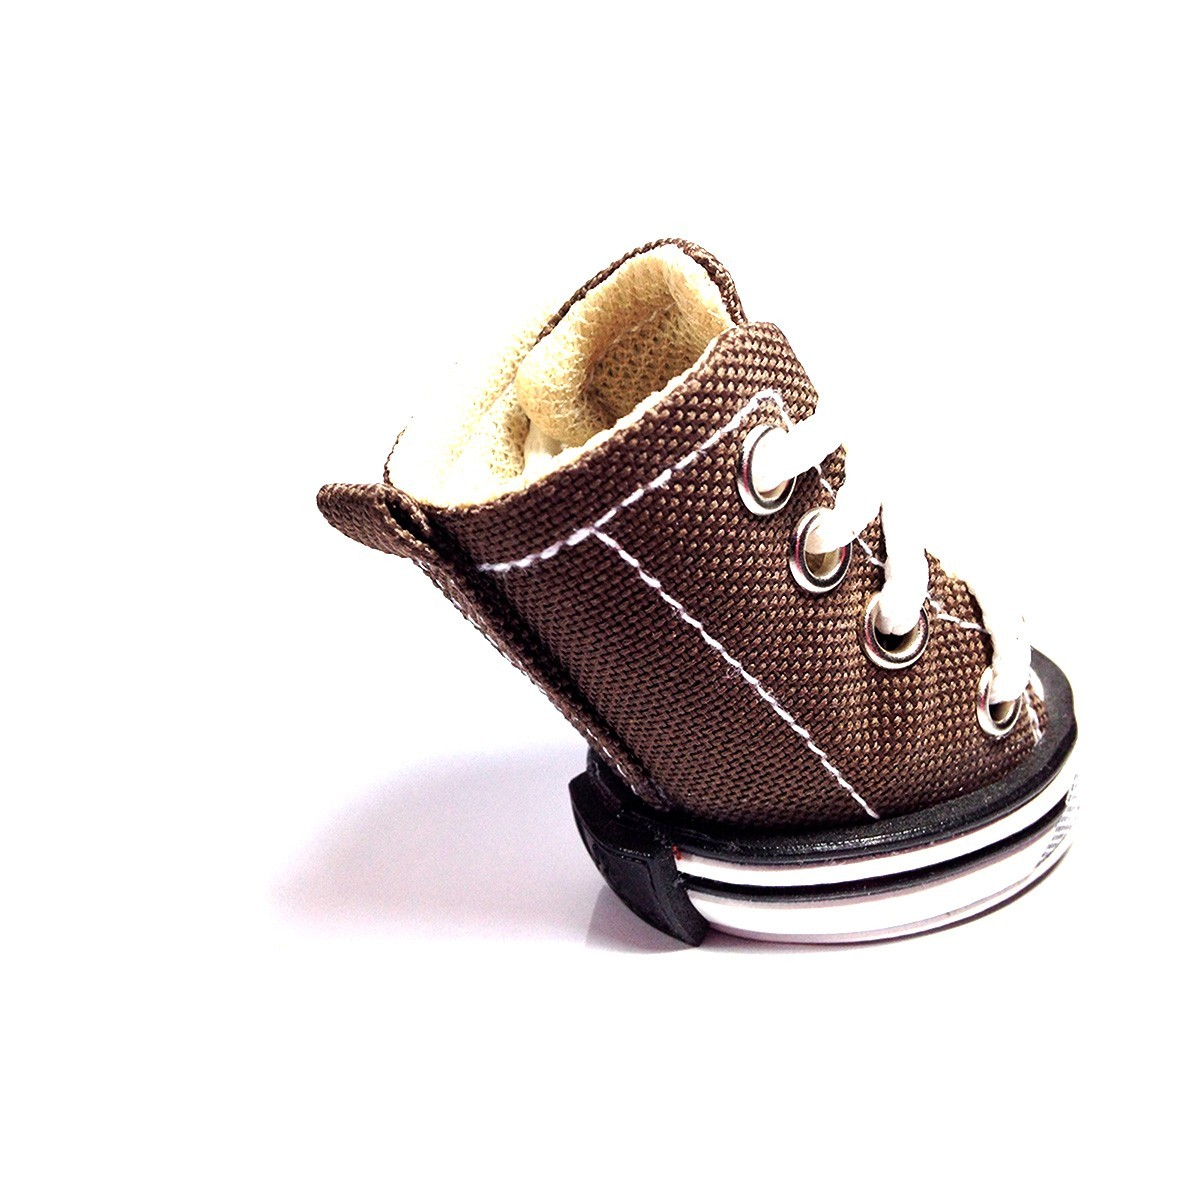 Zapatos Tenis Kpets tipo Converse para Perro. Calzado para